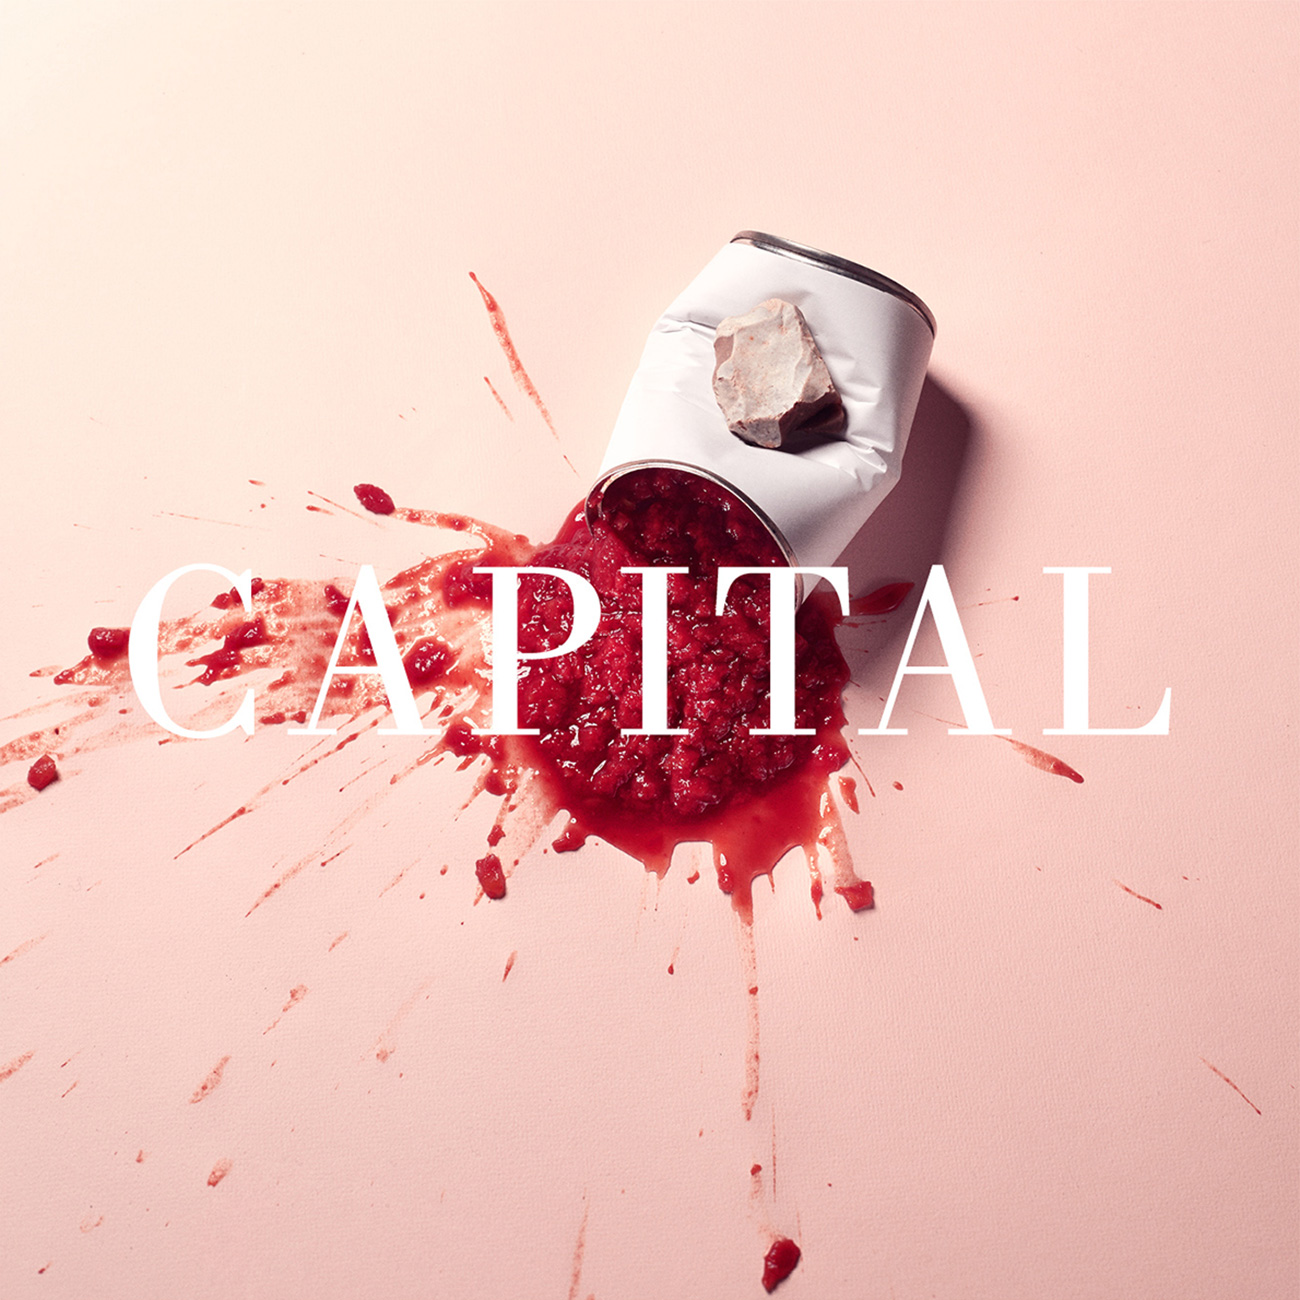 image-face-capital-vecto-02-rvb